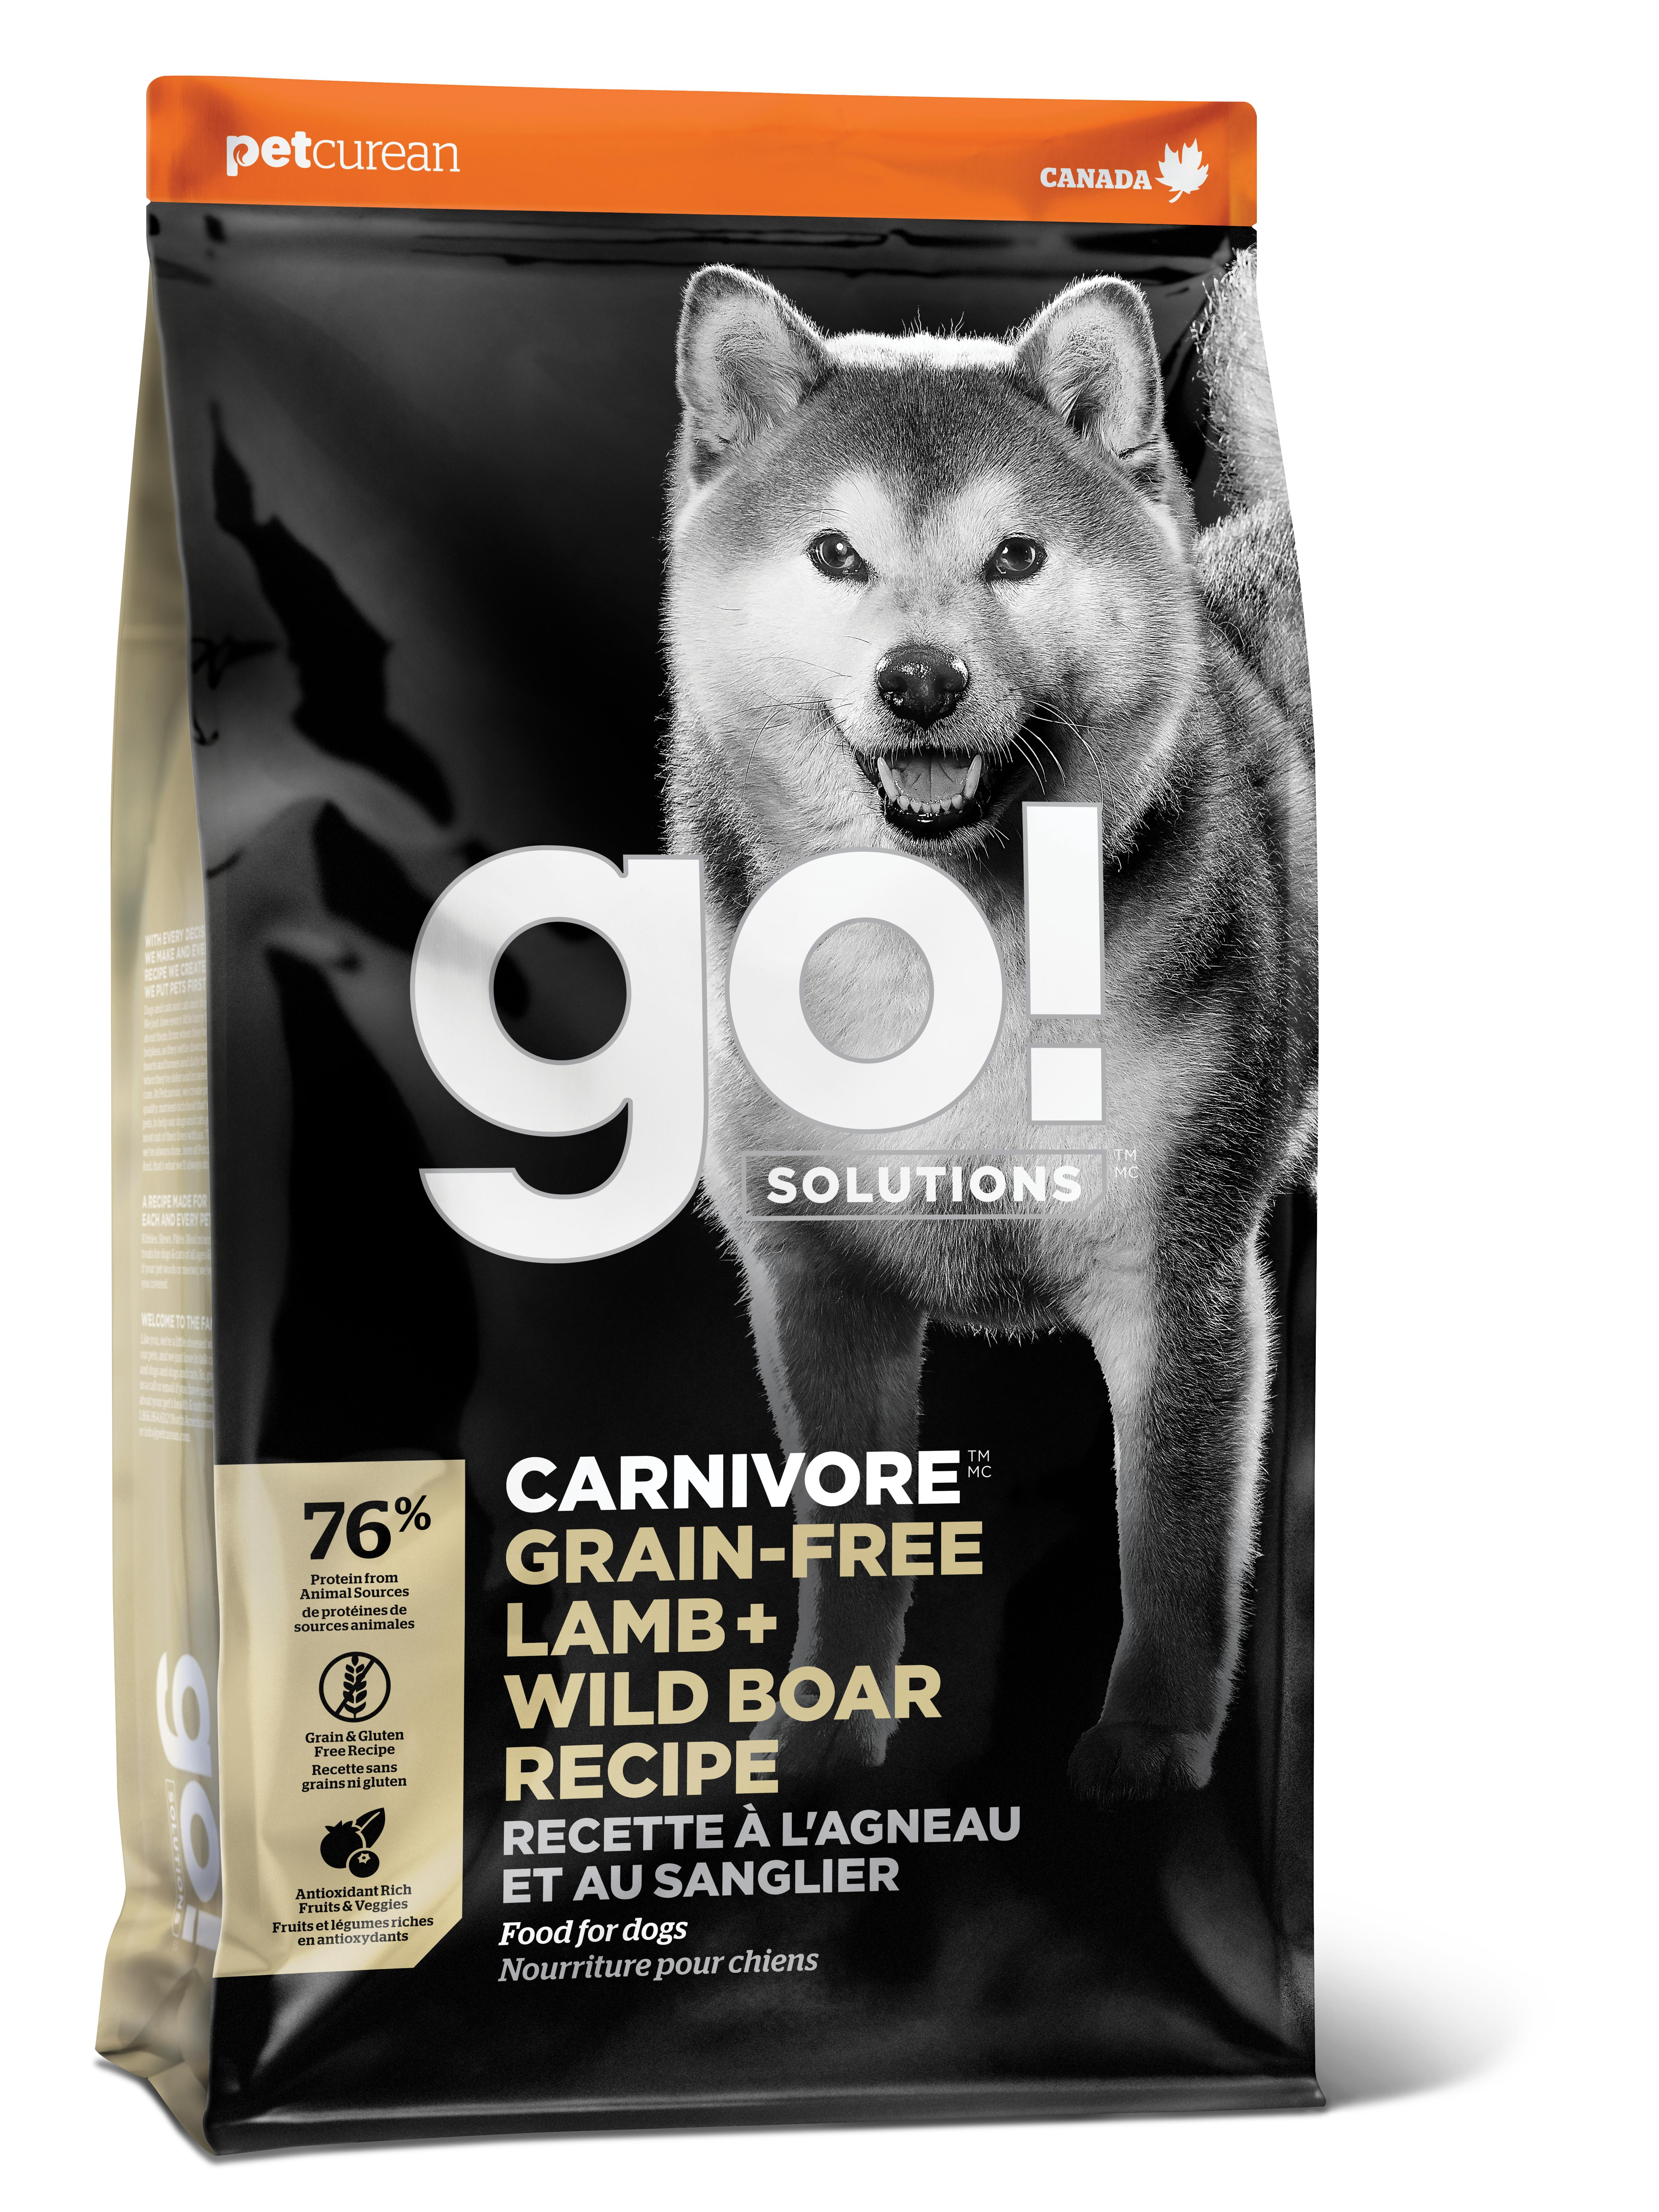 Go! Solutions Carnivore Lamb + Wild Boar Grain-Free Dry Dog Food, 3.5-lb